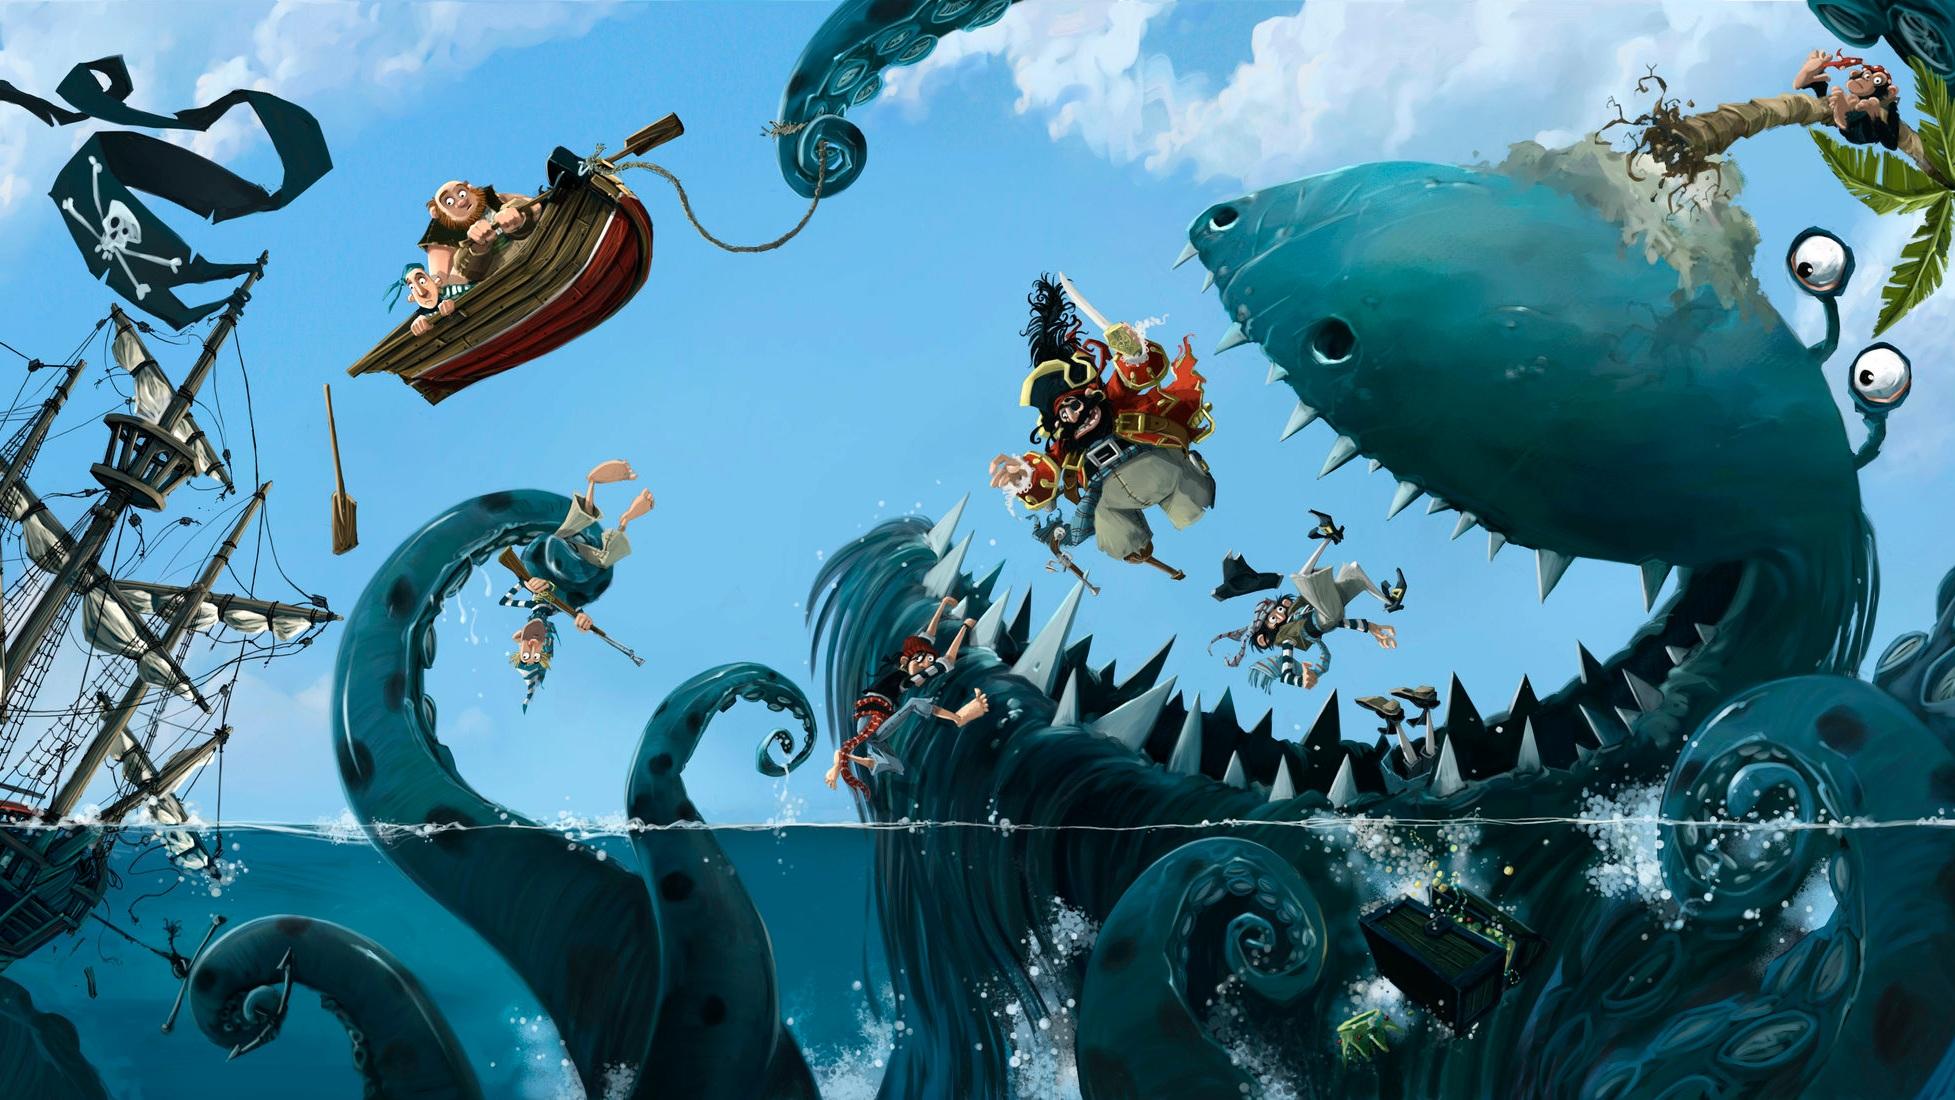 The Pirate Cruncher - FAMILY, THEATRE, MUSIC